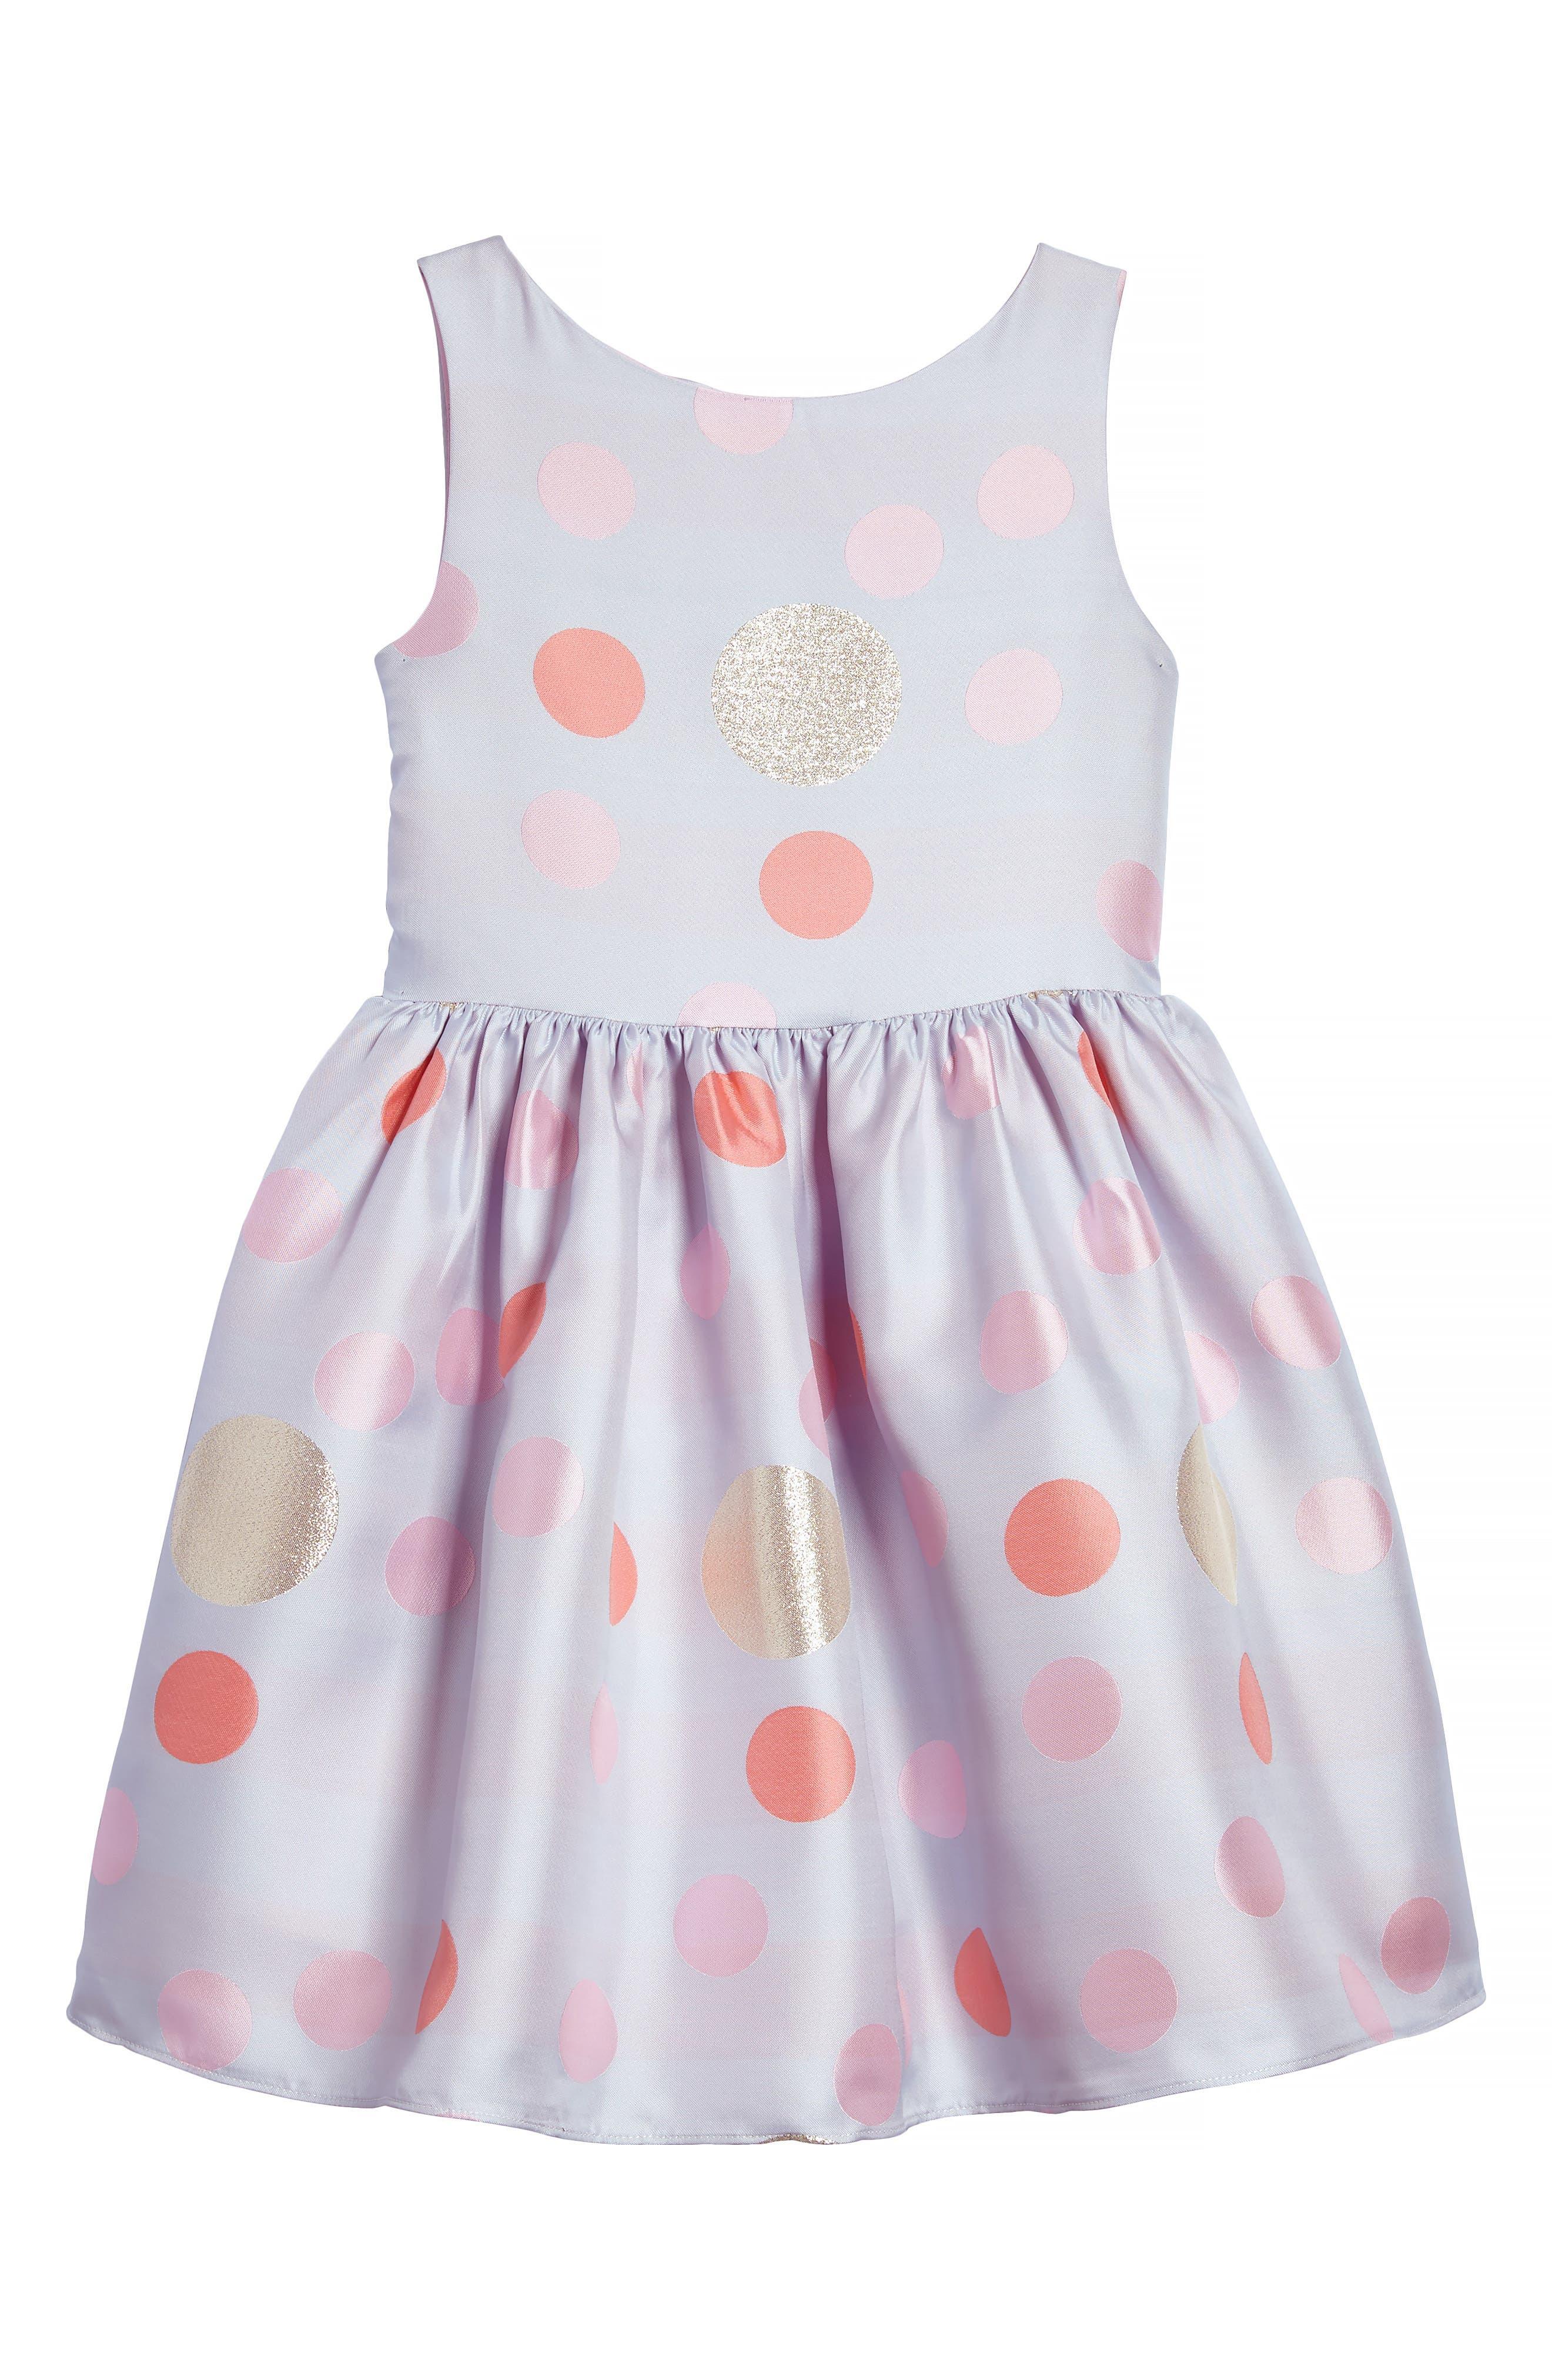 Main Image - Frais Metallic Polka Dot Dress (Toddler Girls, Little Girls & Big Girls)